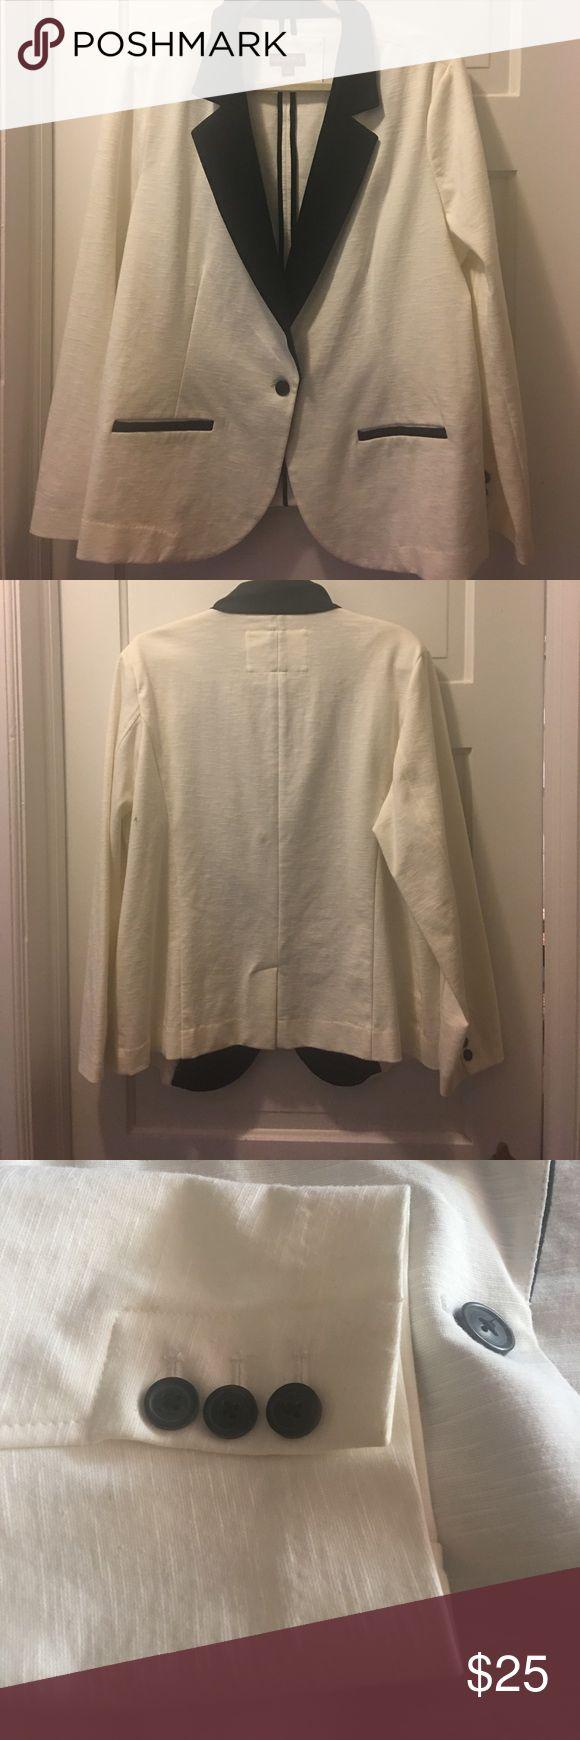 NWOT off white and black blazer NWOT off white and black blazer!  Stretchy material! Merona Jackets & Coats Blazers